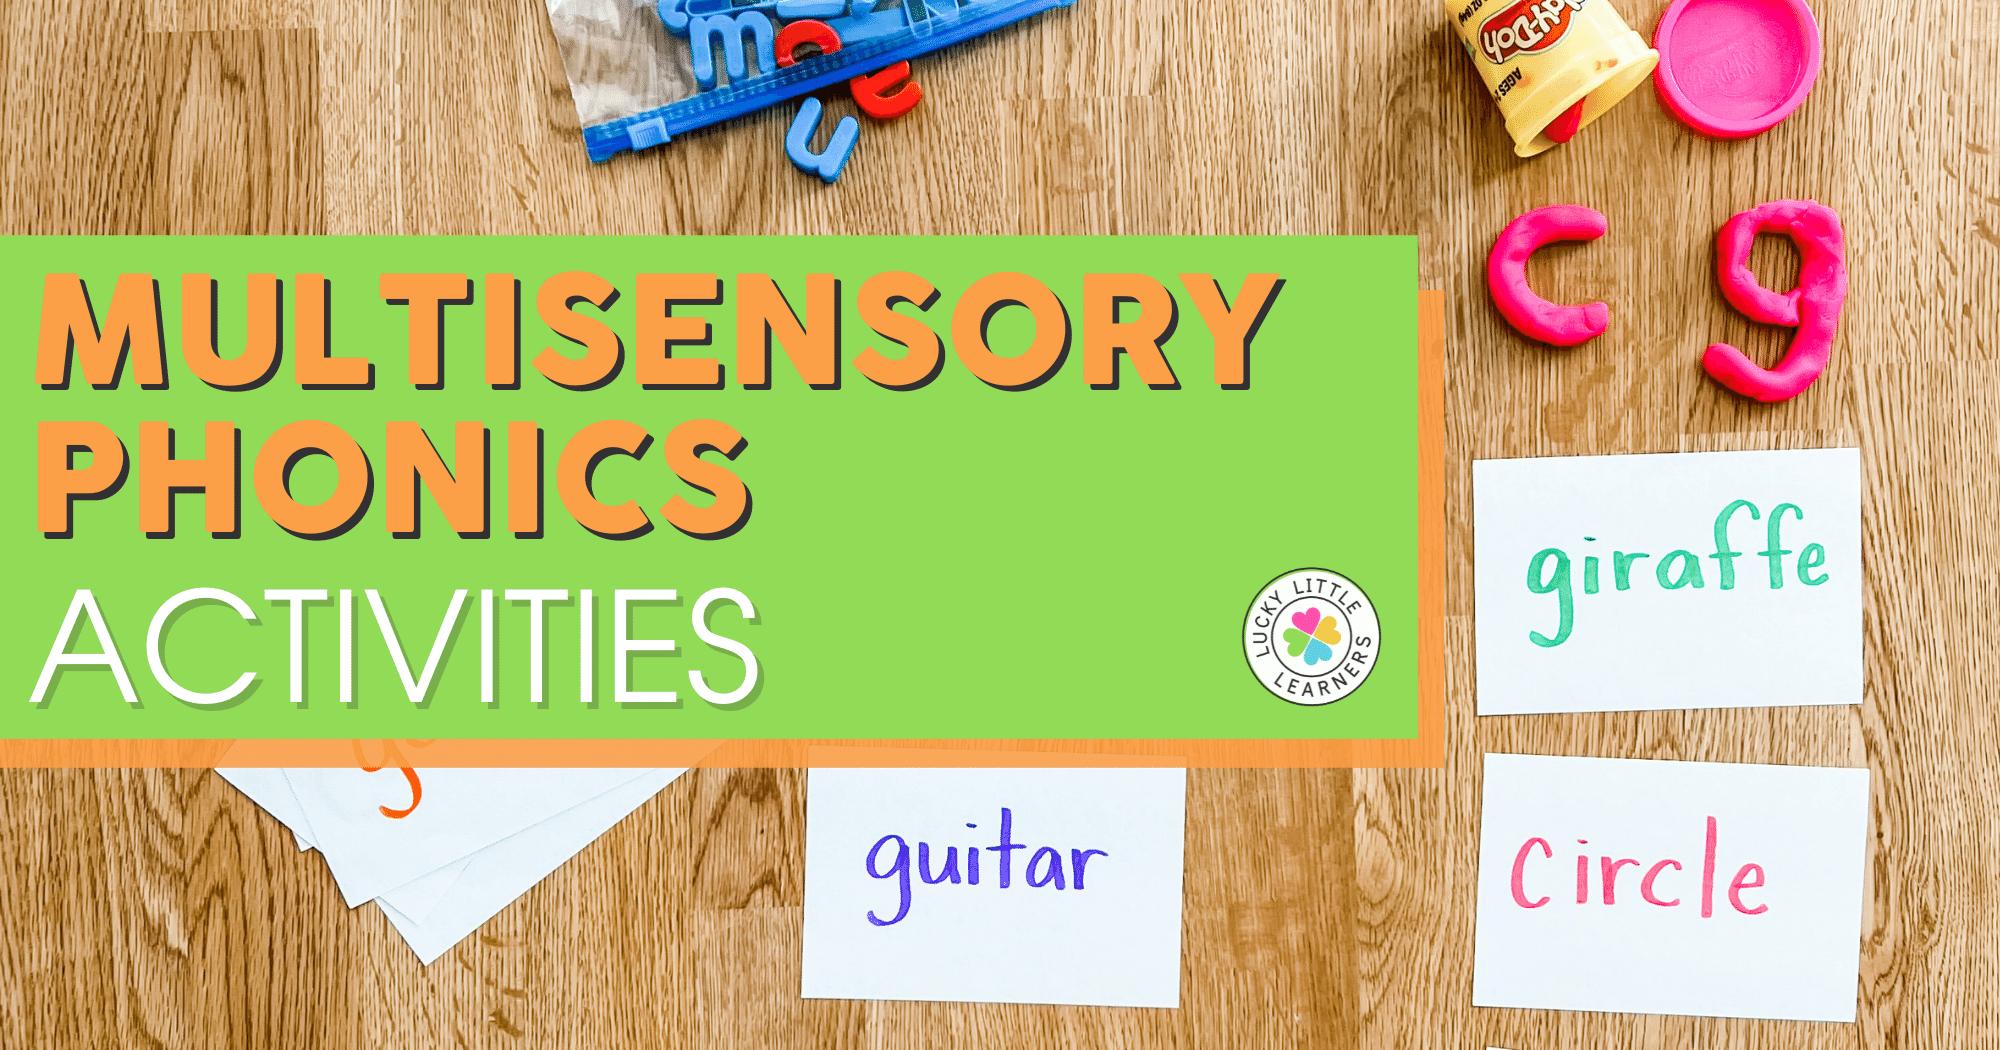 Multisensory Phonics Activities